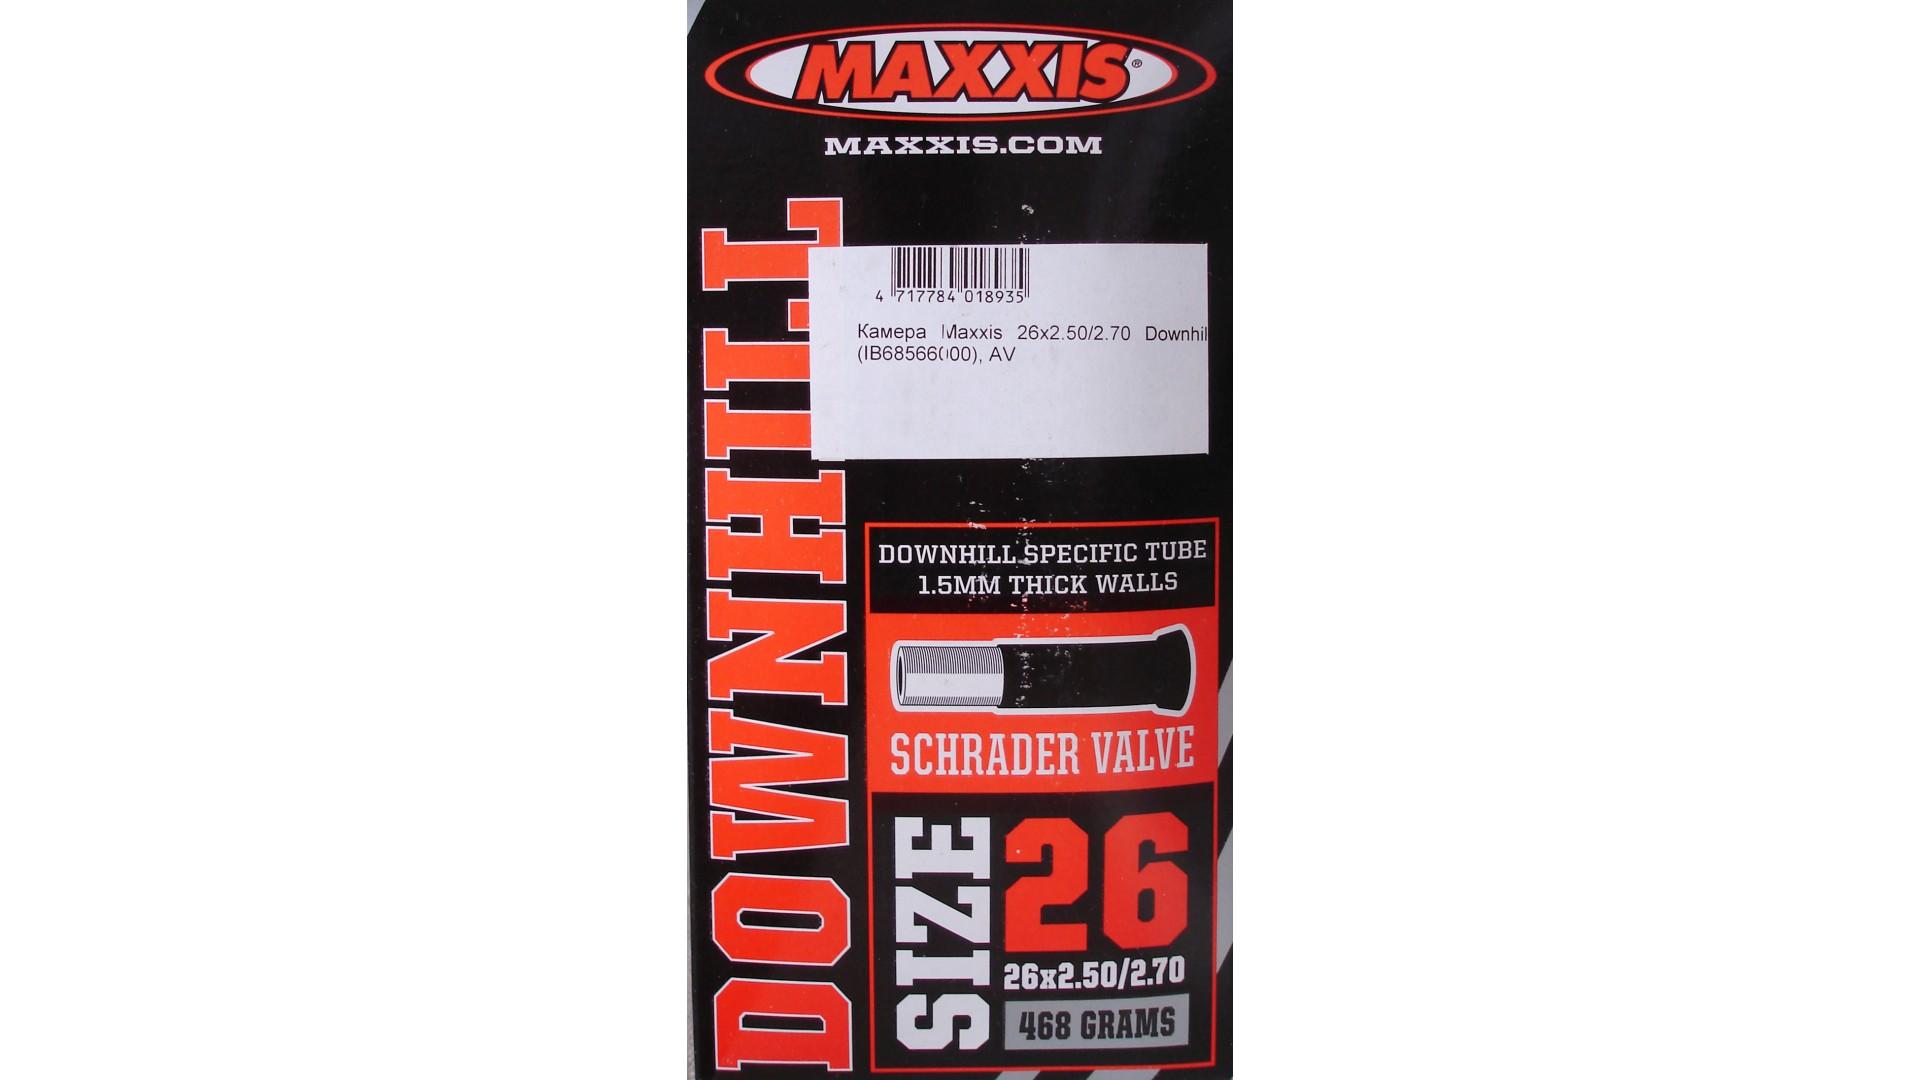 Камера Maxxis 26x2.50/2.70 Downhill AV